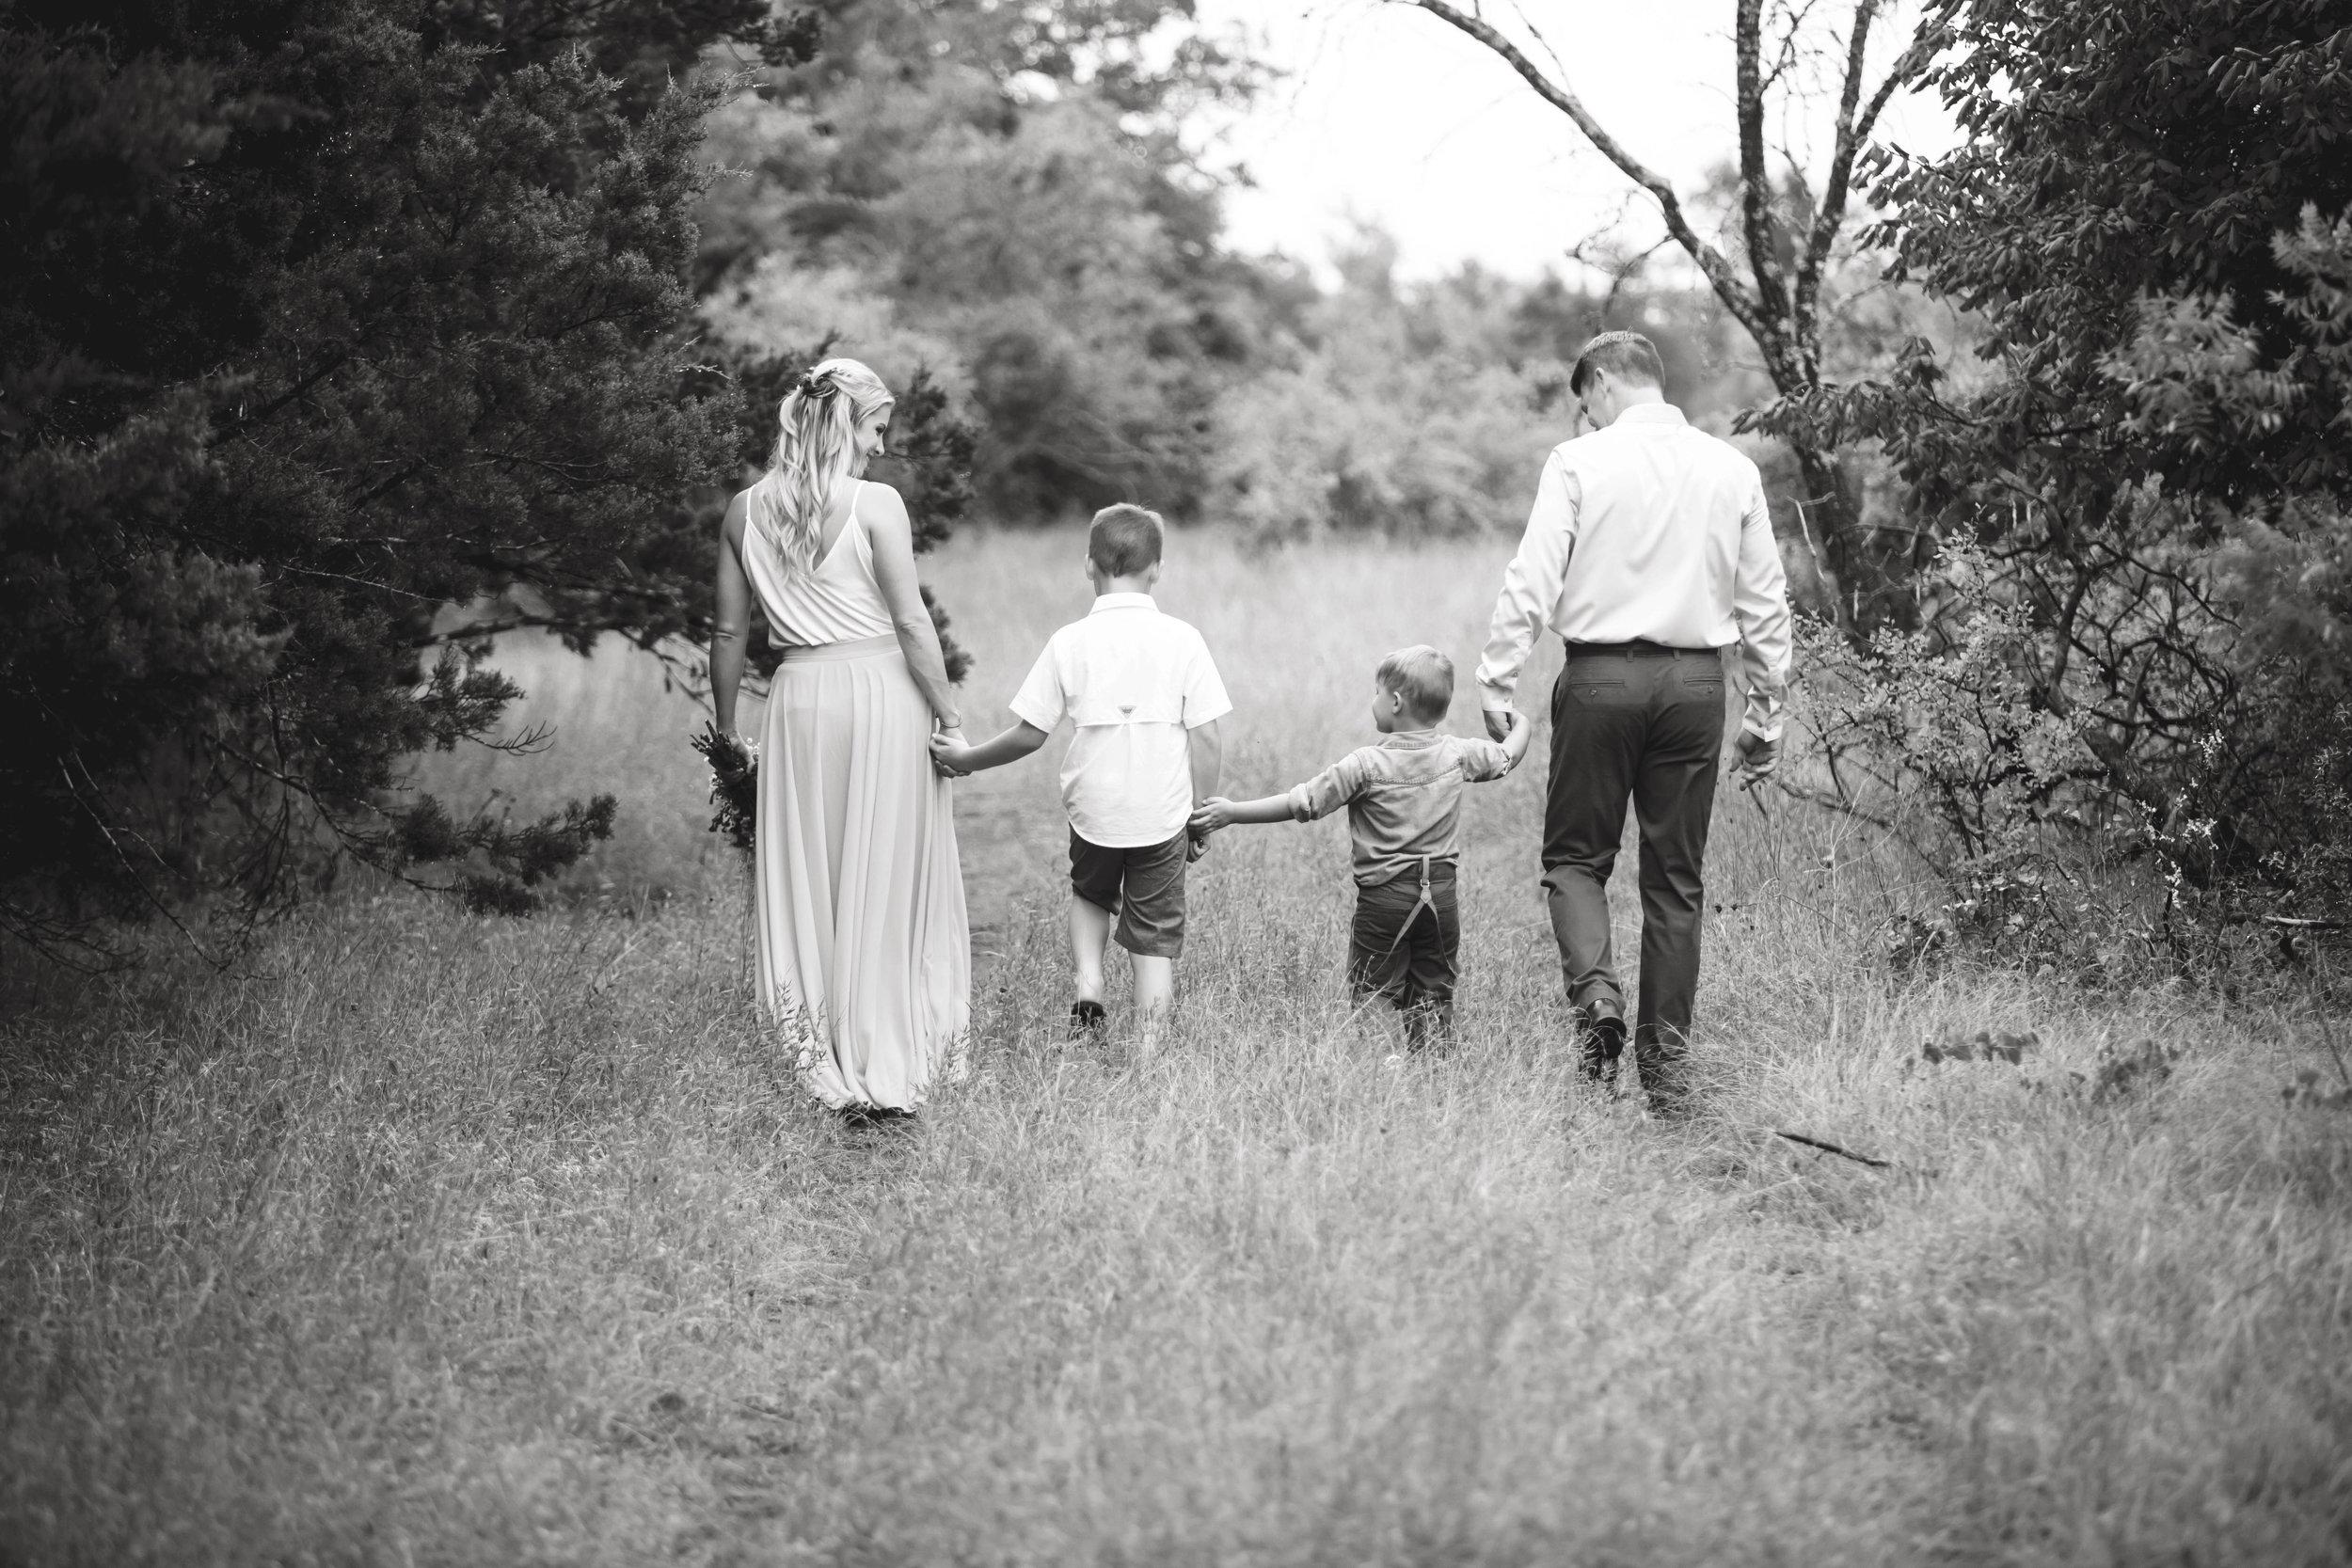 Marble_Falls_Milliorn_Family_Photographer_Jenna_Petty_02.jpg